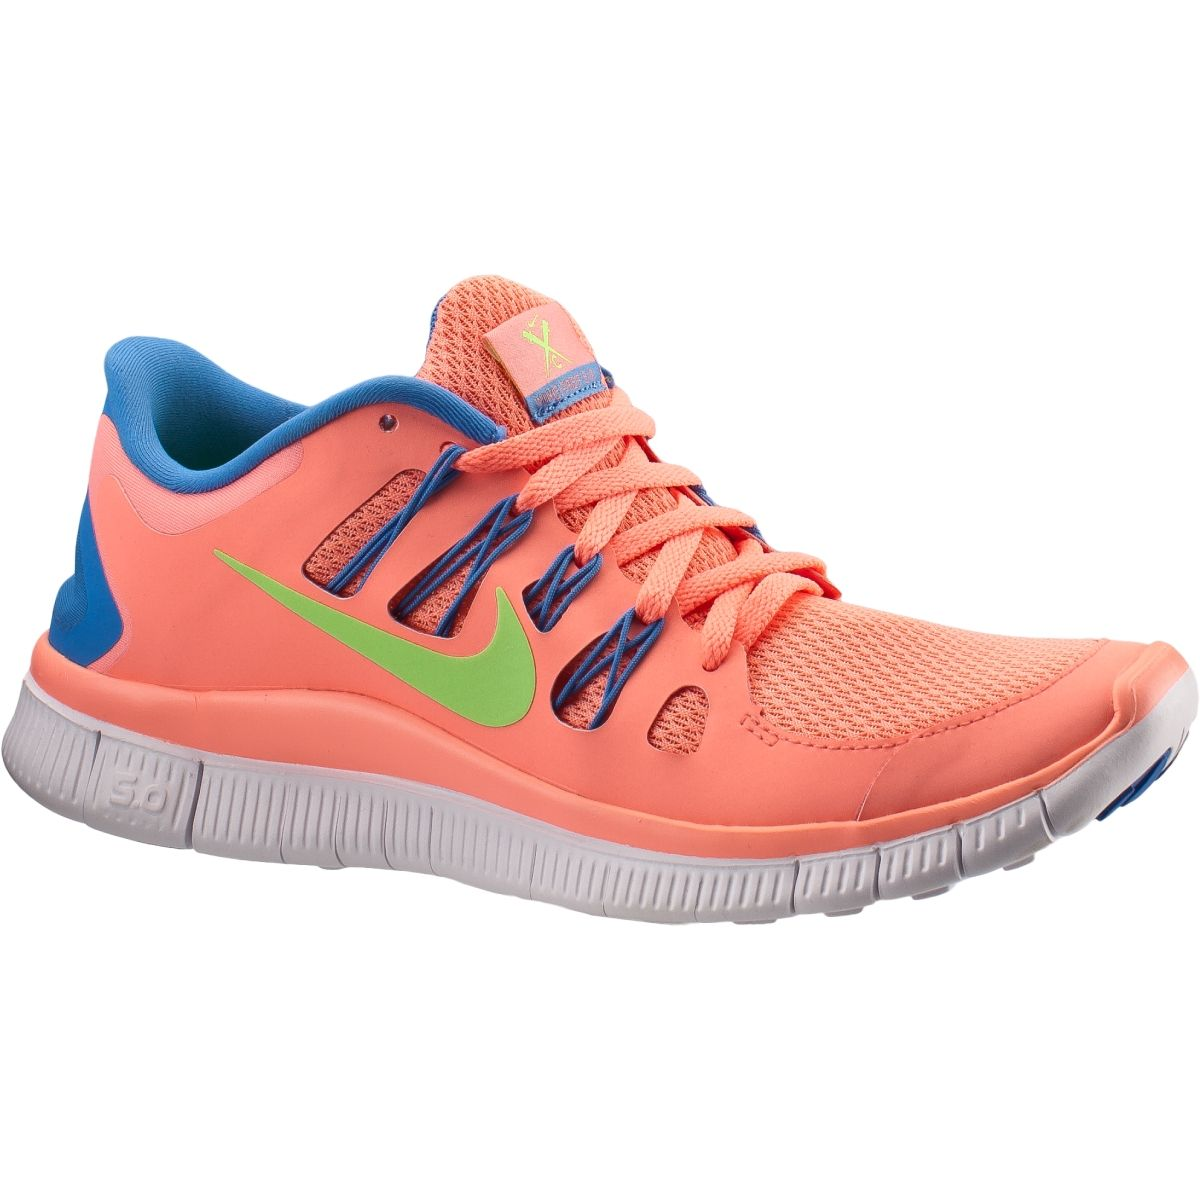 fa75b1985225 ... france nike free 5.0 running shoes womens sportchek 0cbd3 07948 ...